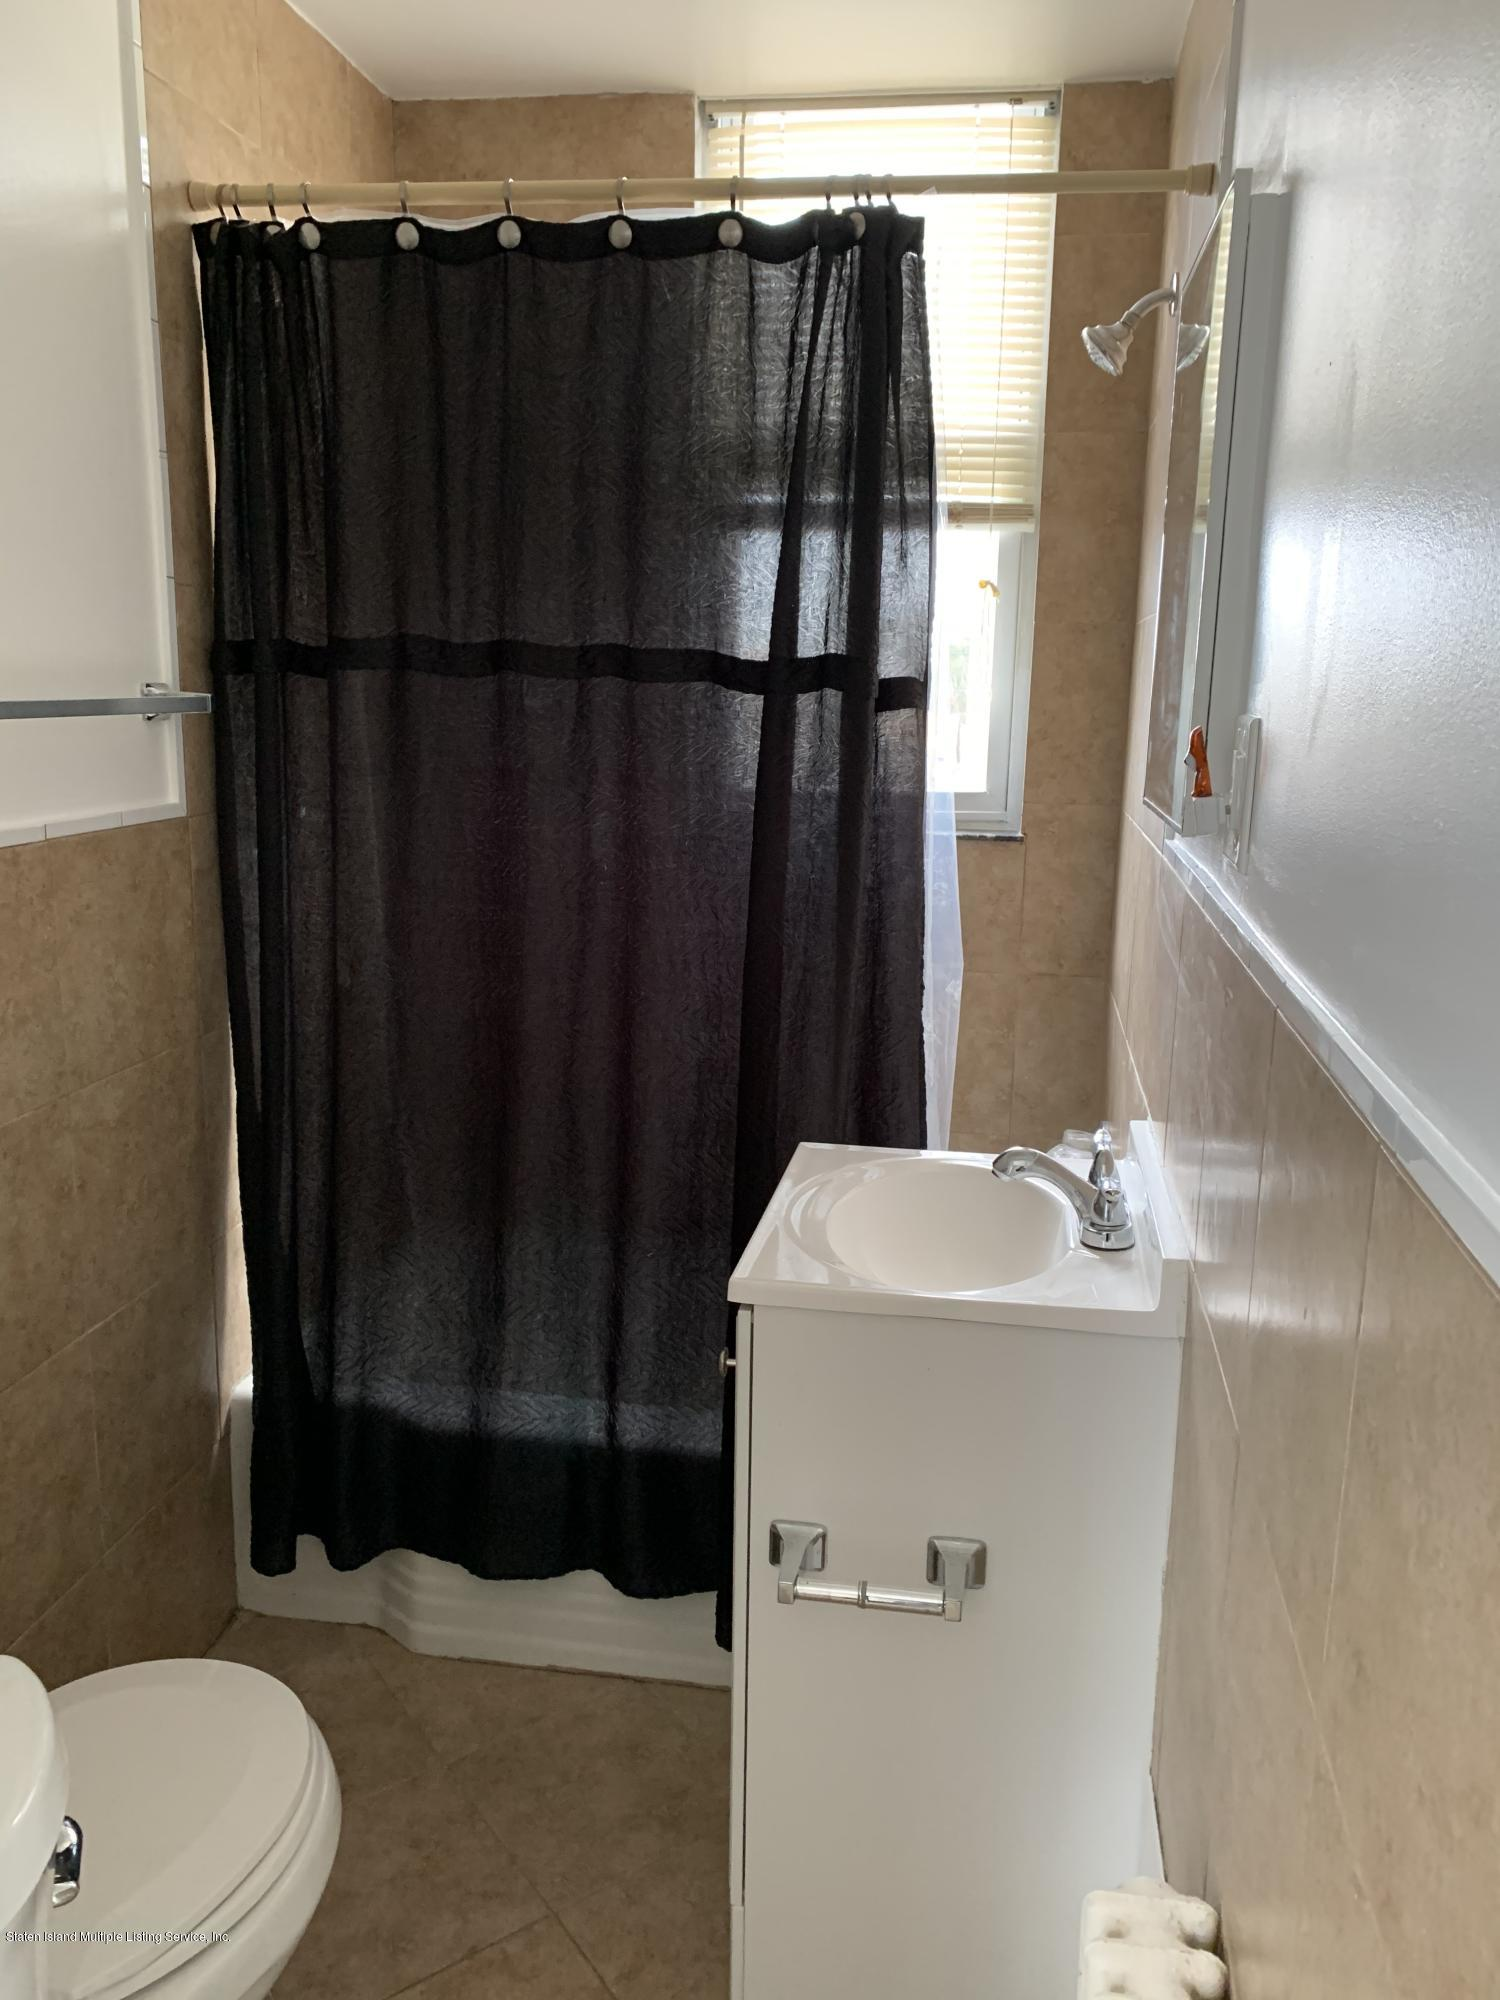 2a 31 Florida Avenue,Staten Island,New York,10305,United States,1 Bedroom Bedrooms,3 Rooms Rooms,1 BathroomBathrooms,Res-Rental,Florida,1135472